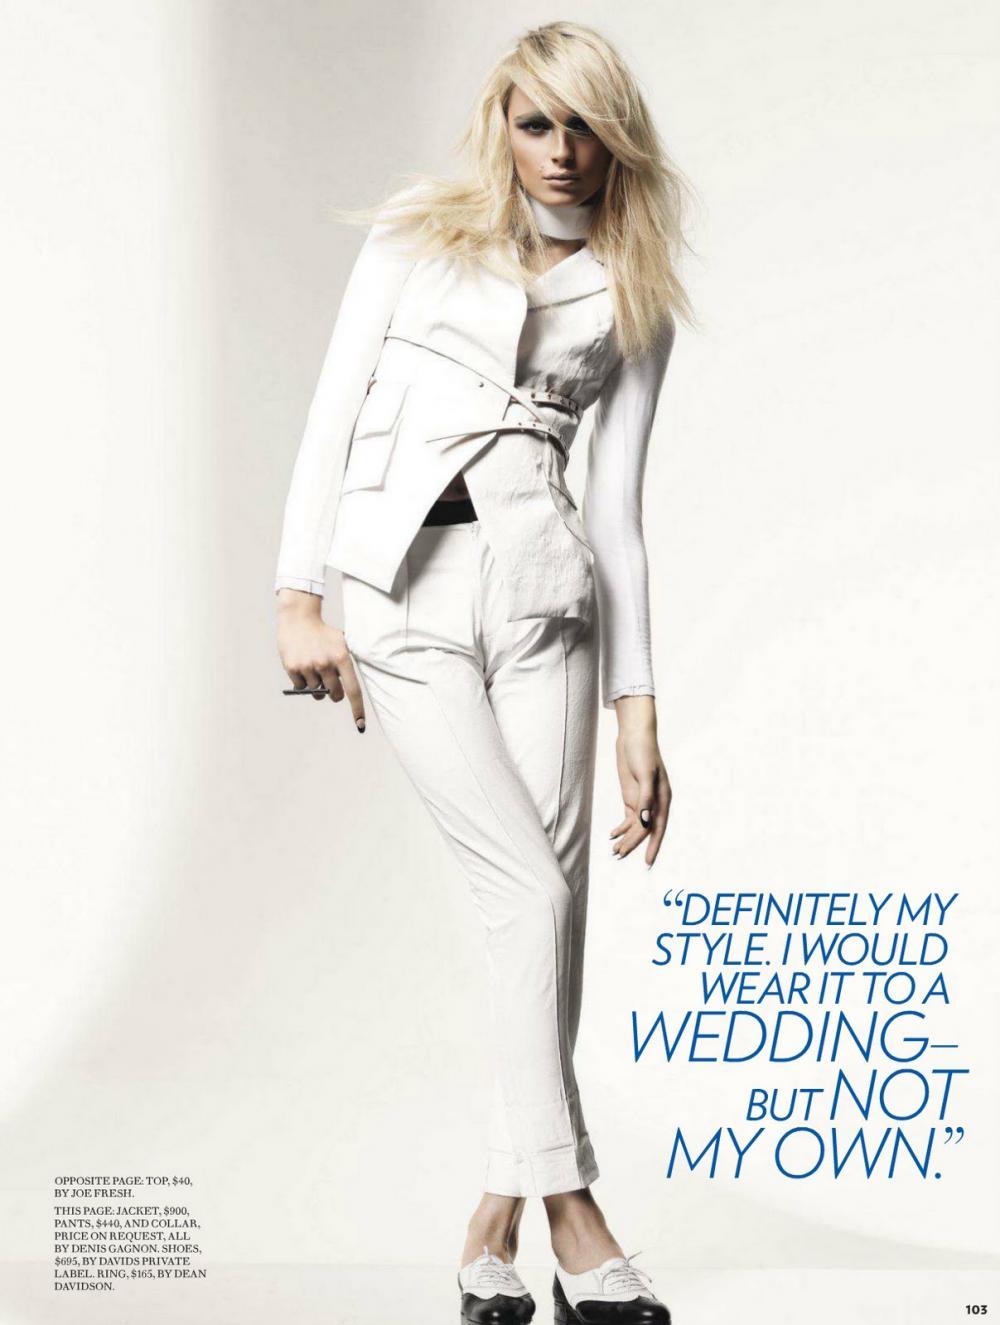 Fashion Magazine Canada The Love Issue February 2012